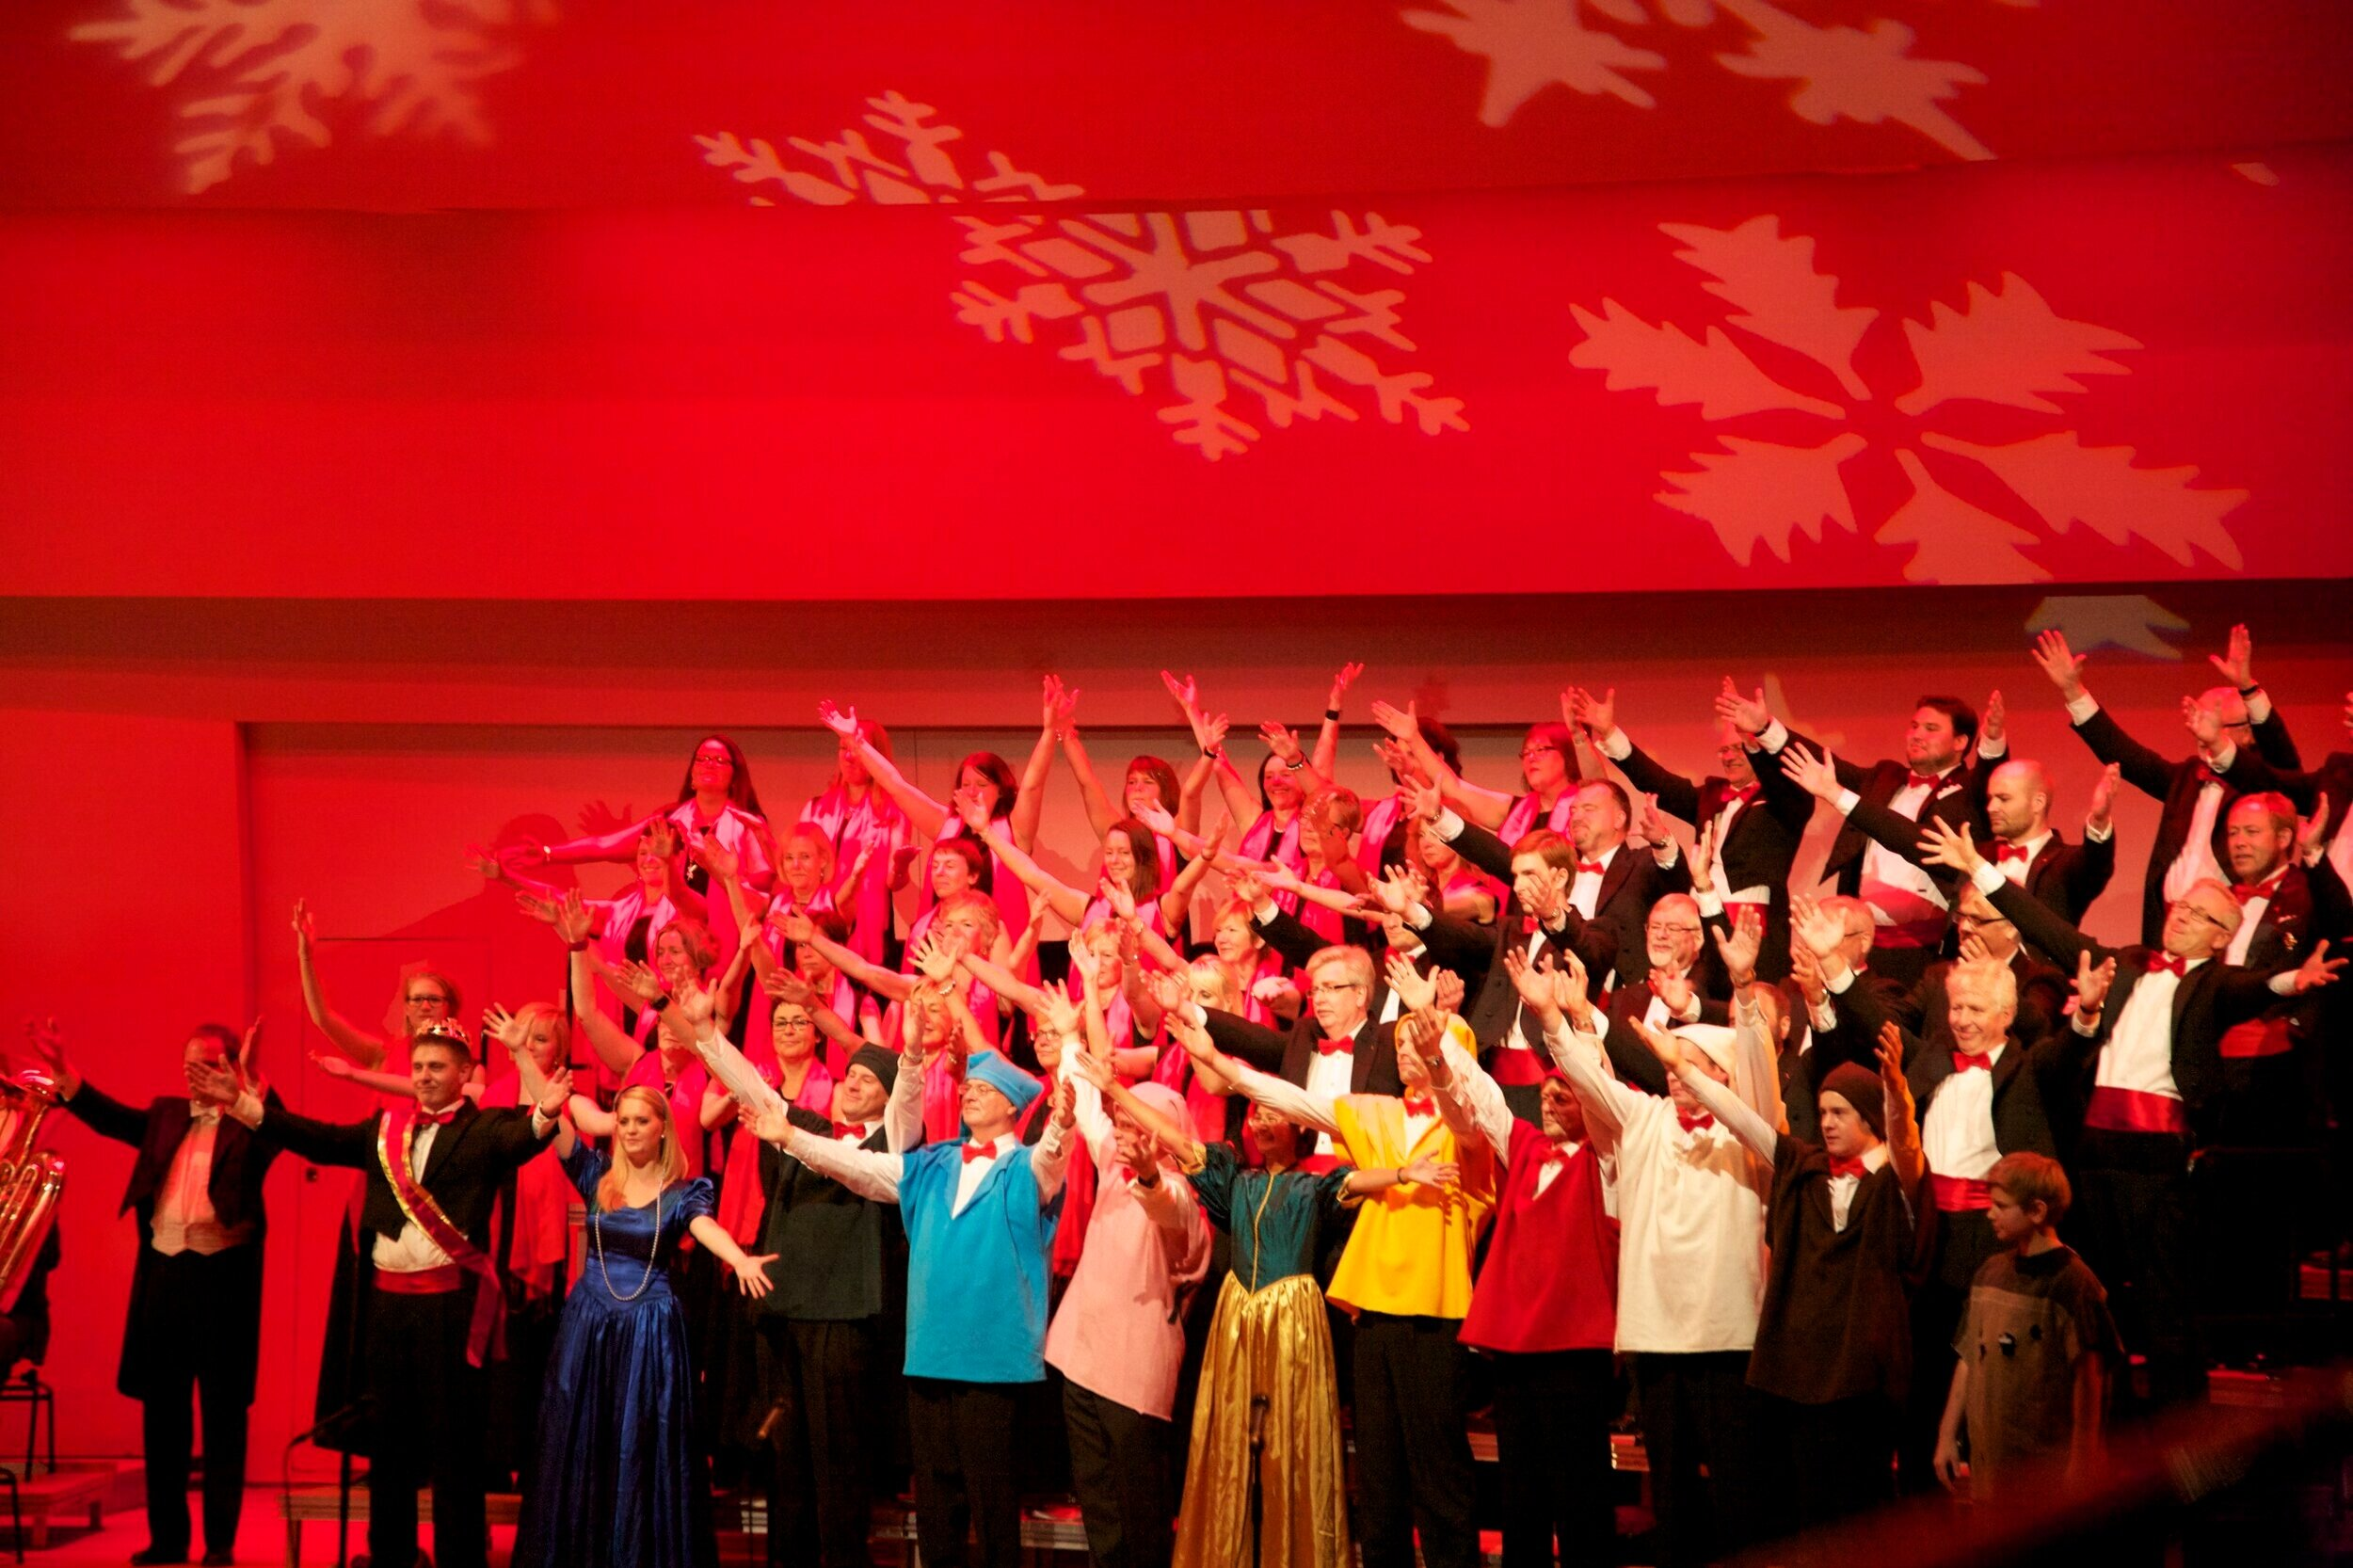 ChristmasCarols2010_Photo09.jpg